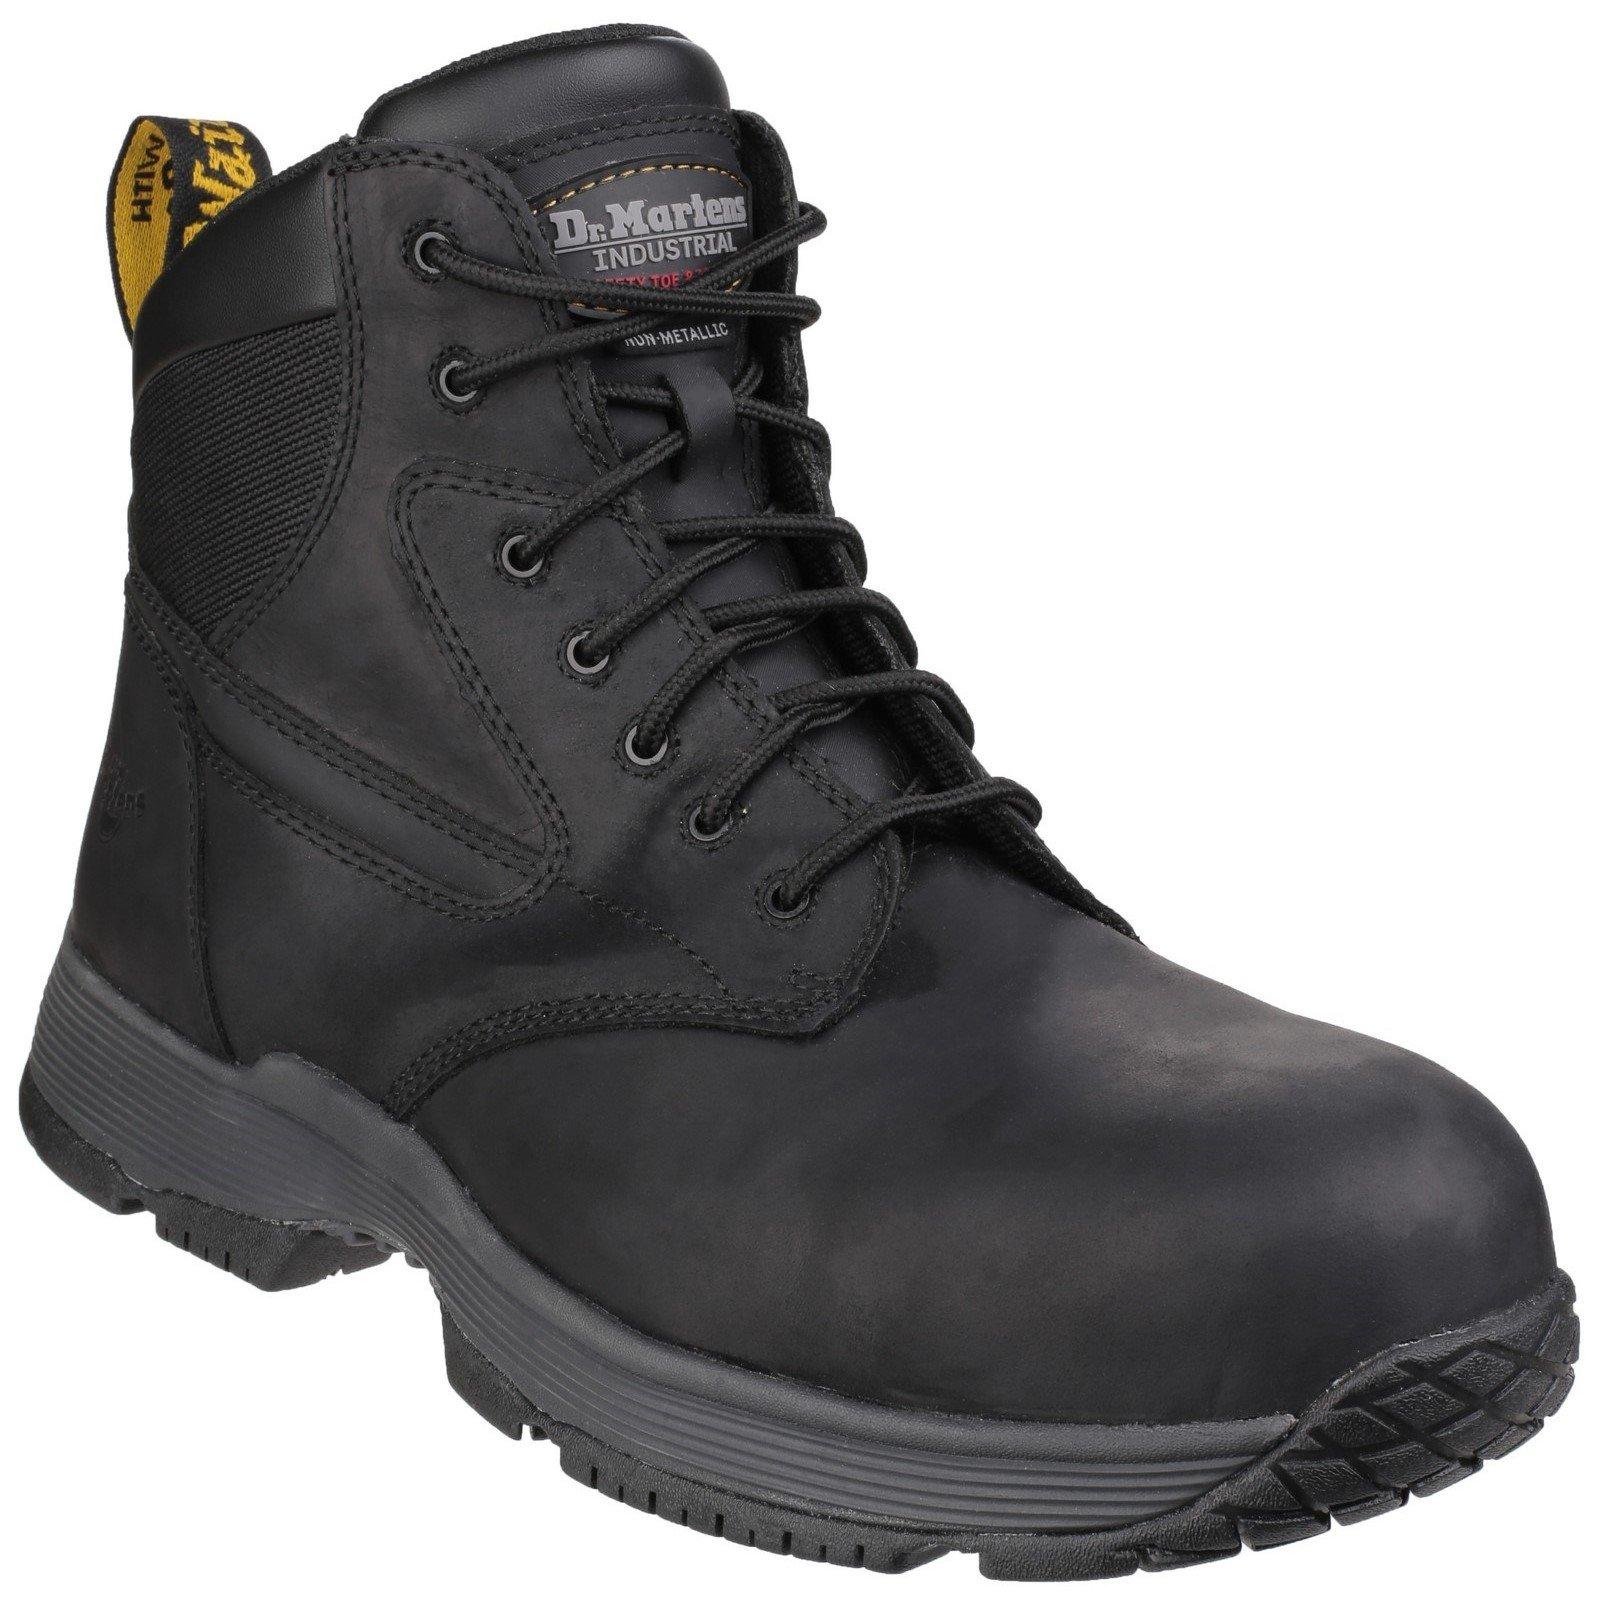 Dr Martens Unisex Corvid Composite Lace up Safety Boot Black 24862-41125 - Black 10